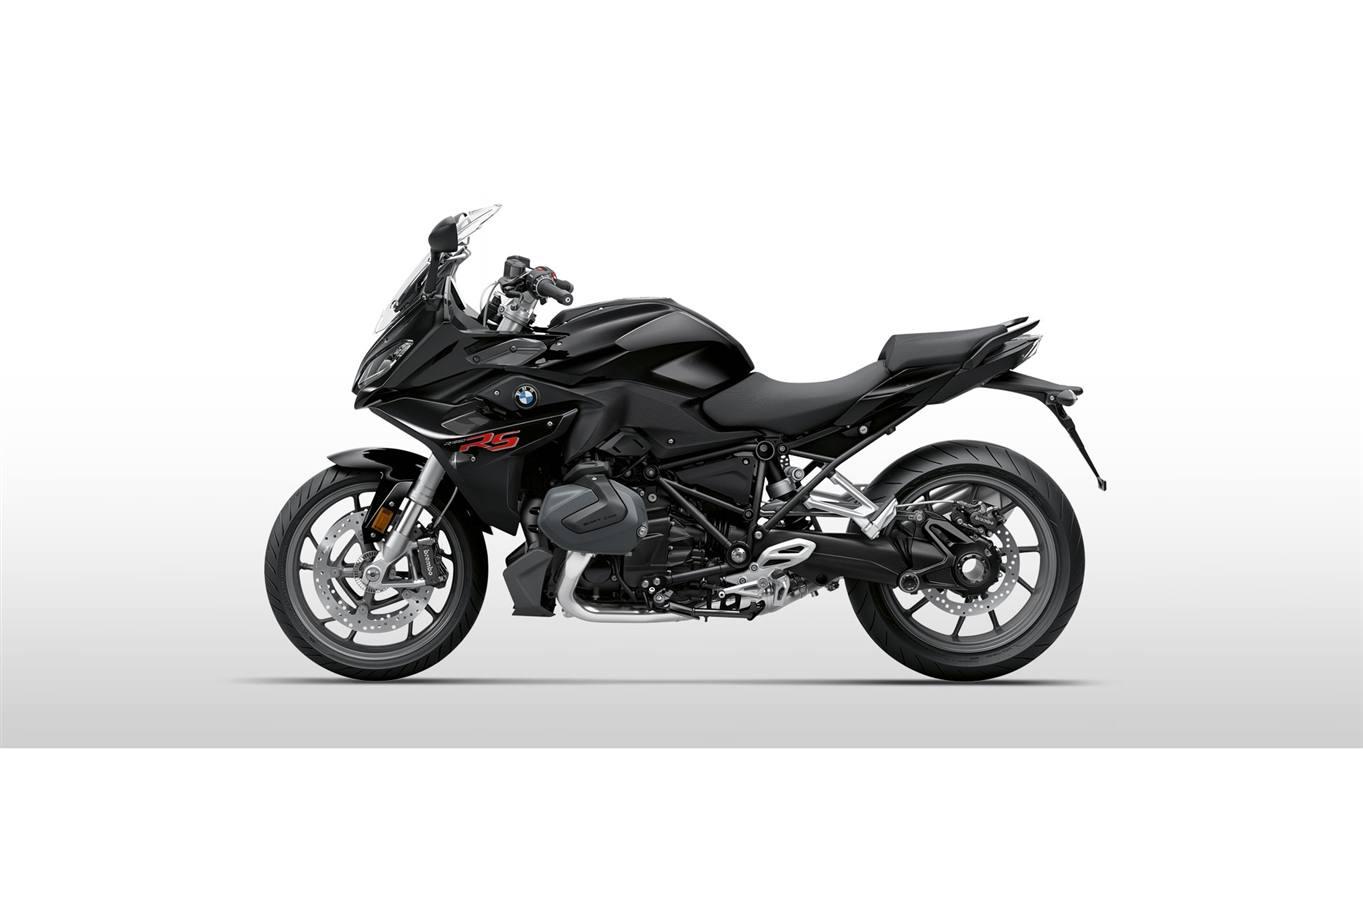 2020 Bmw R 1250 Rs For Sale In Fredericksburg Va Morton S Bmw Motorcycles Fredericksburg Va 540 891 9844